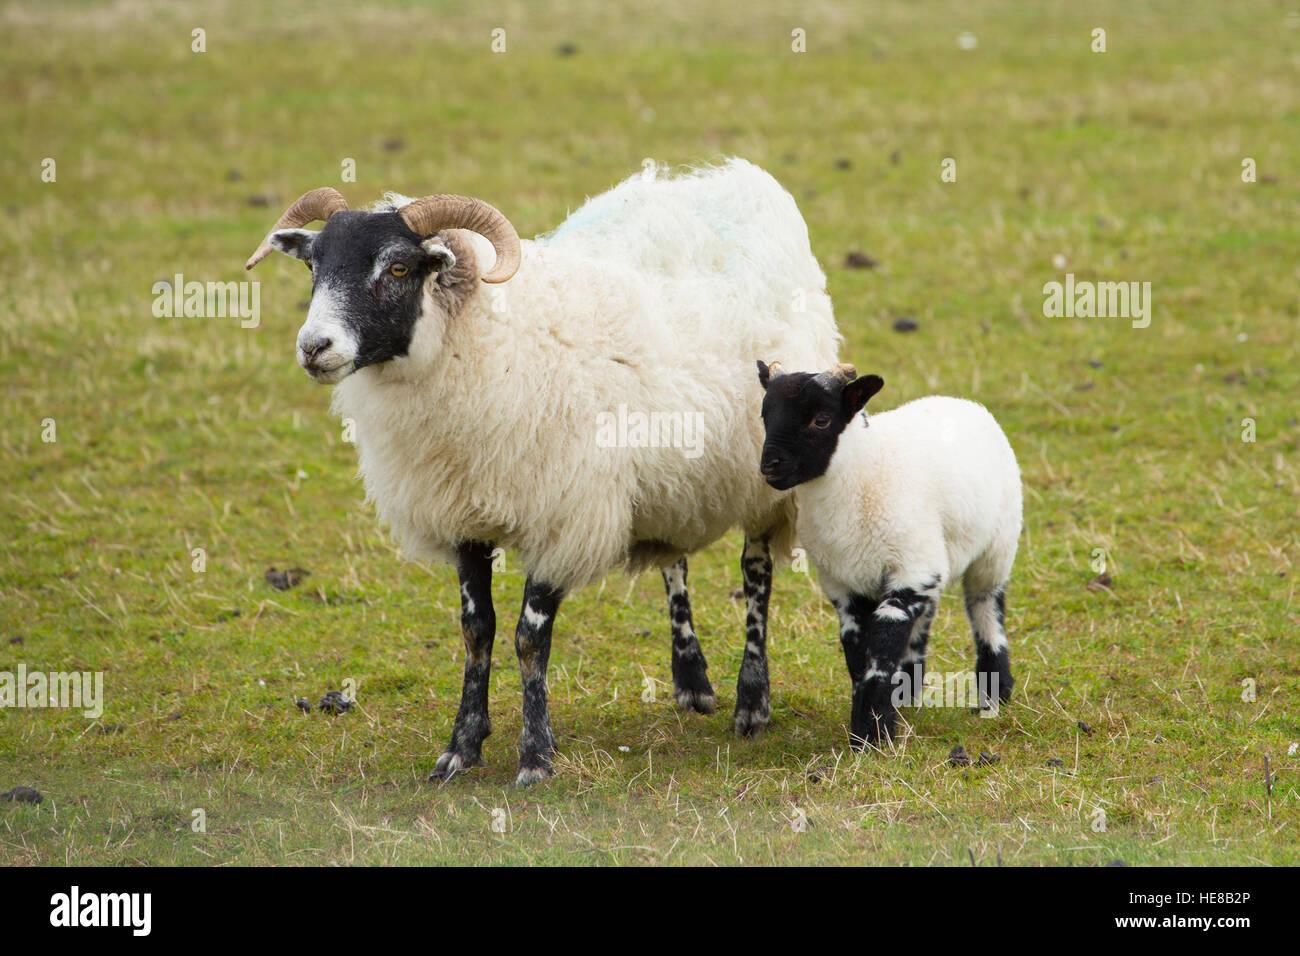 Scottish sheep isle of Mull Scotland uk with horns and white and black legs - Stock Image